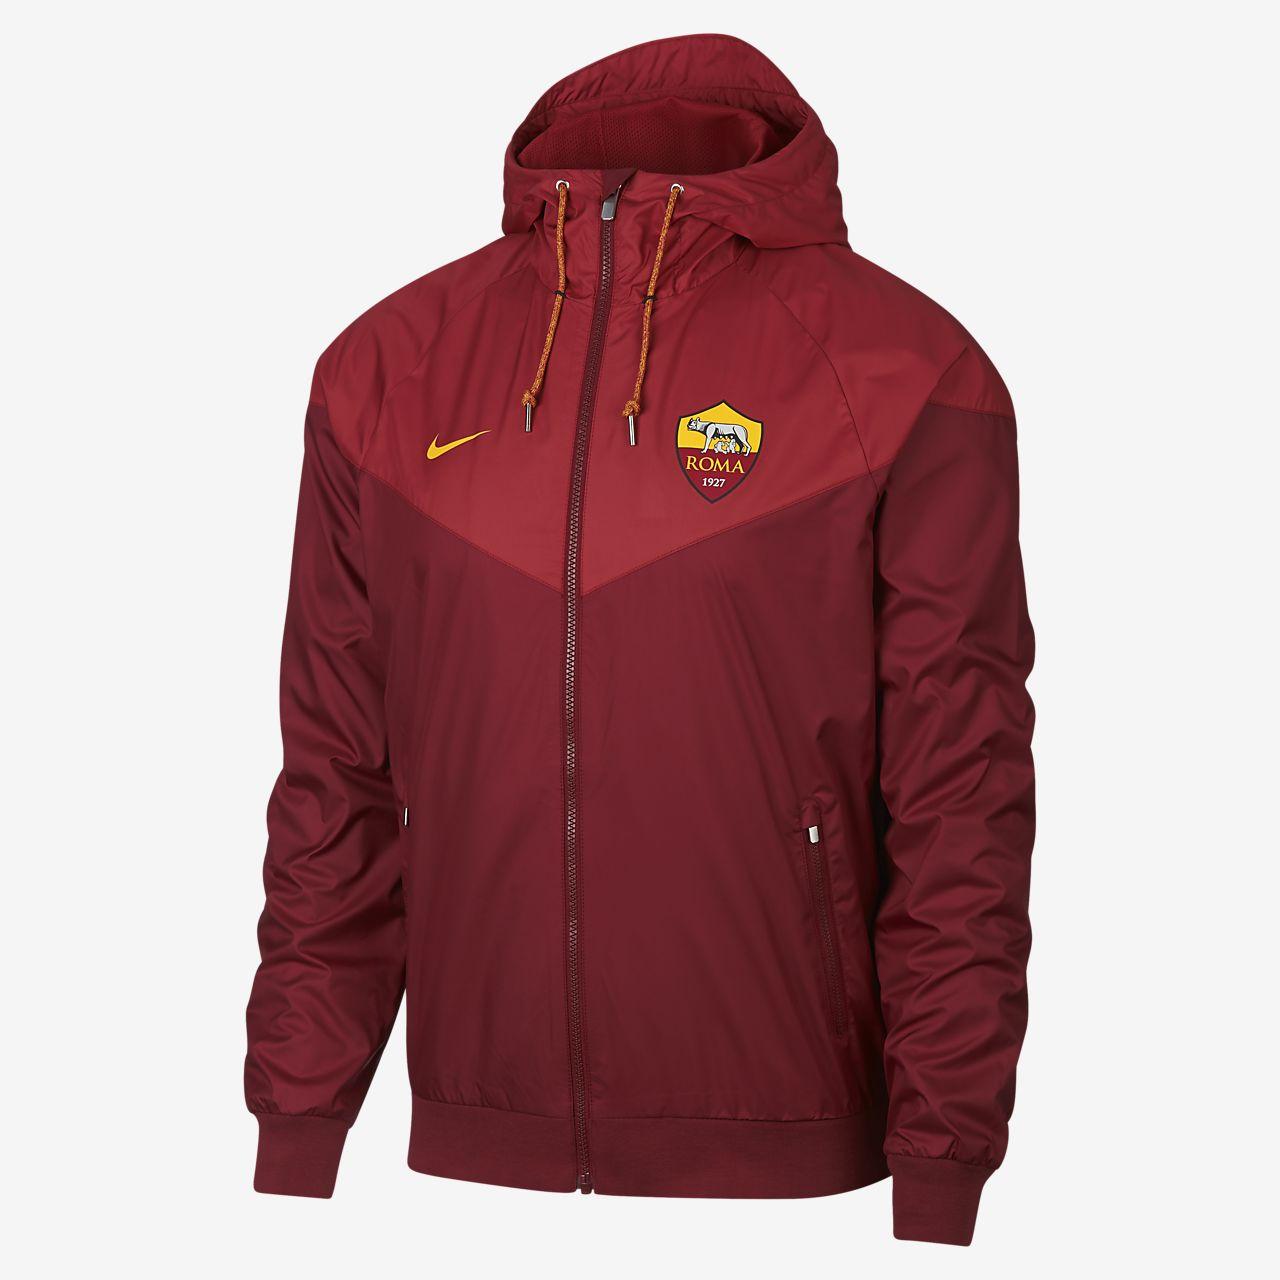 d8e39ff7c307 AS Roma Windrunner Men s Jacket. Nike.com SA